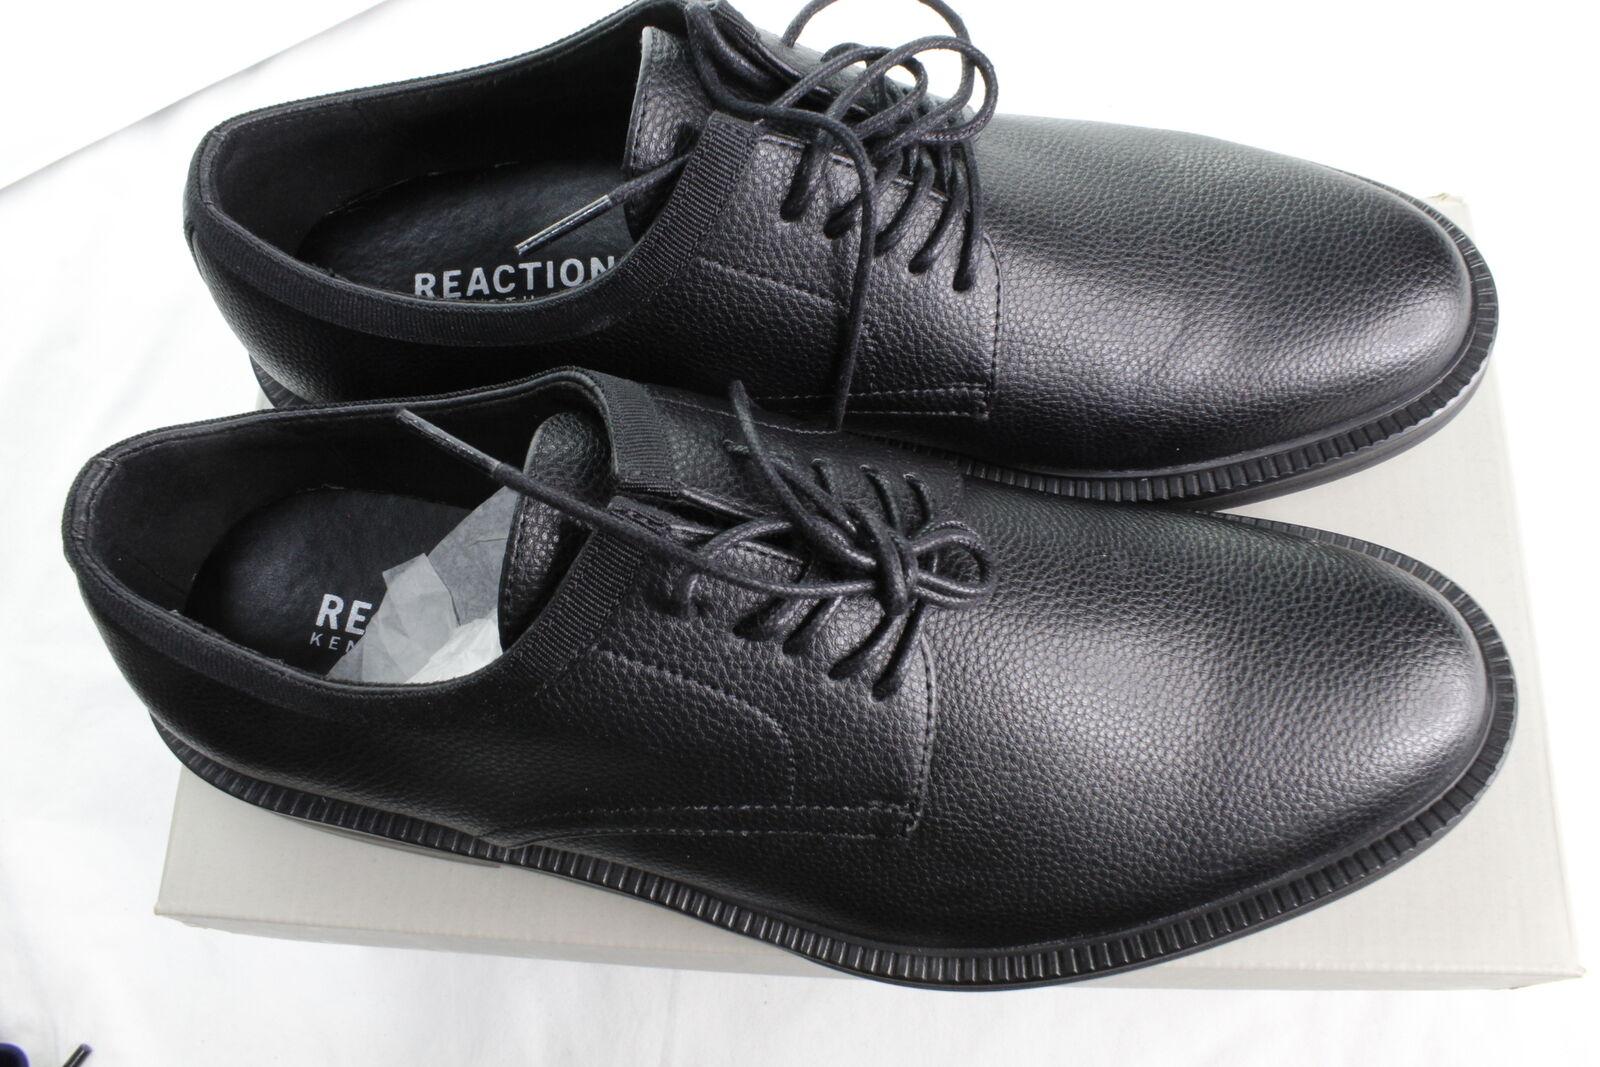 New Kenneth Cole Reaction Strive Oxford Shoes Black JL0